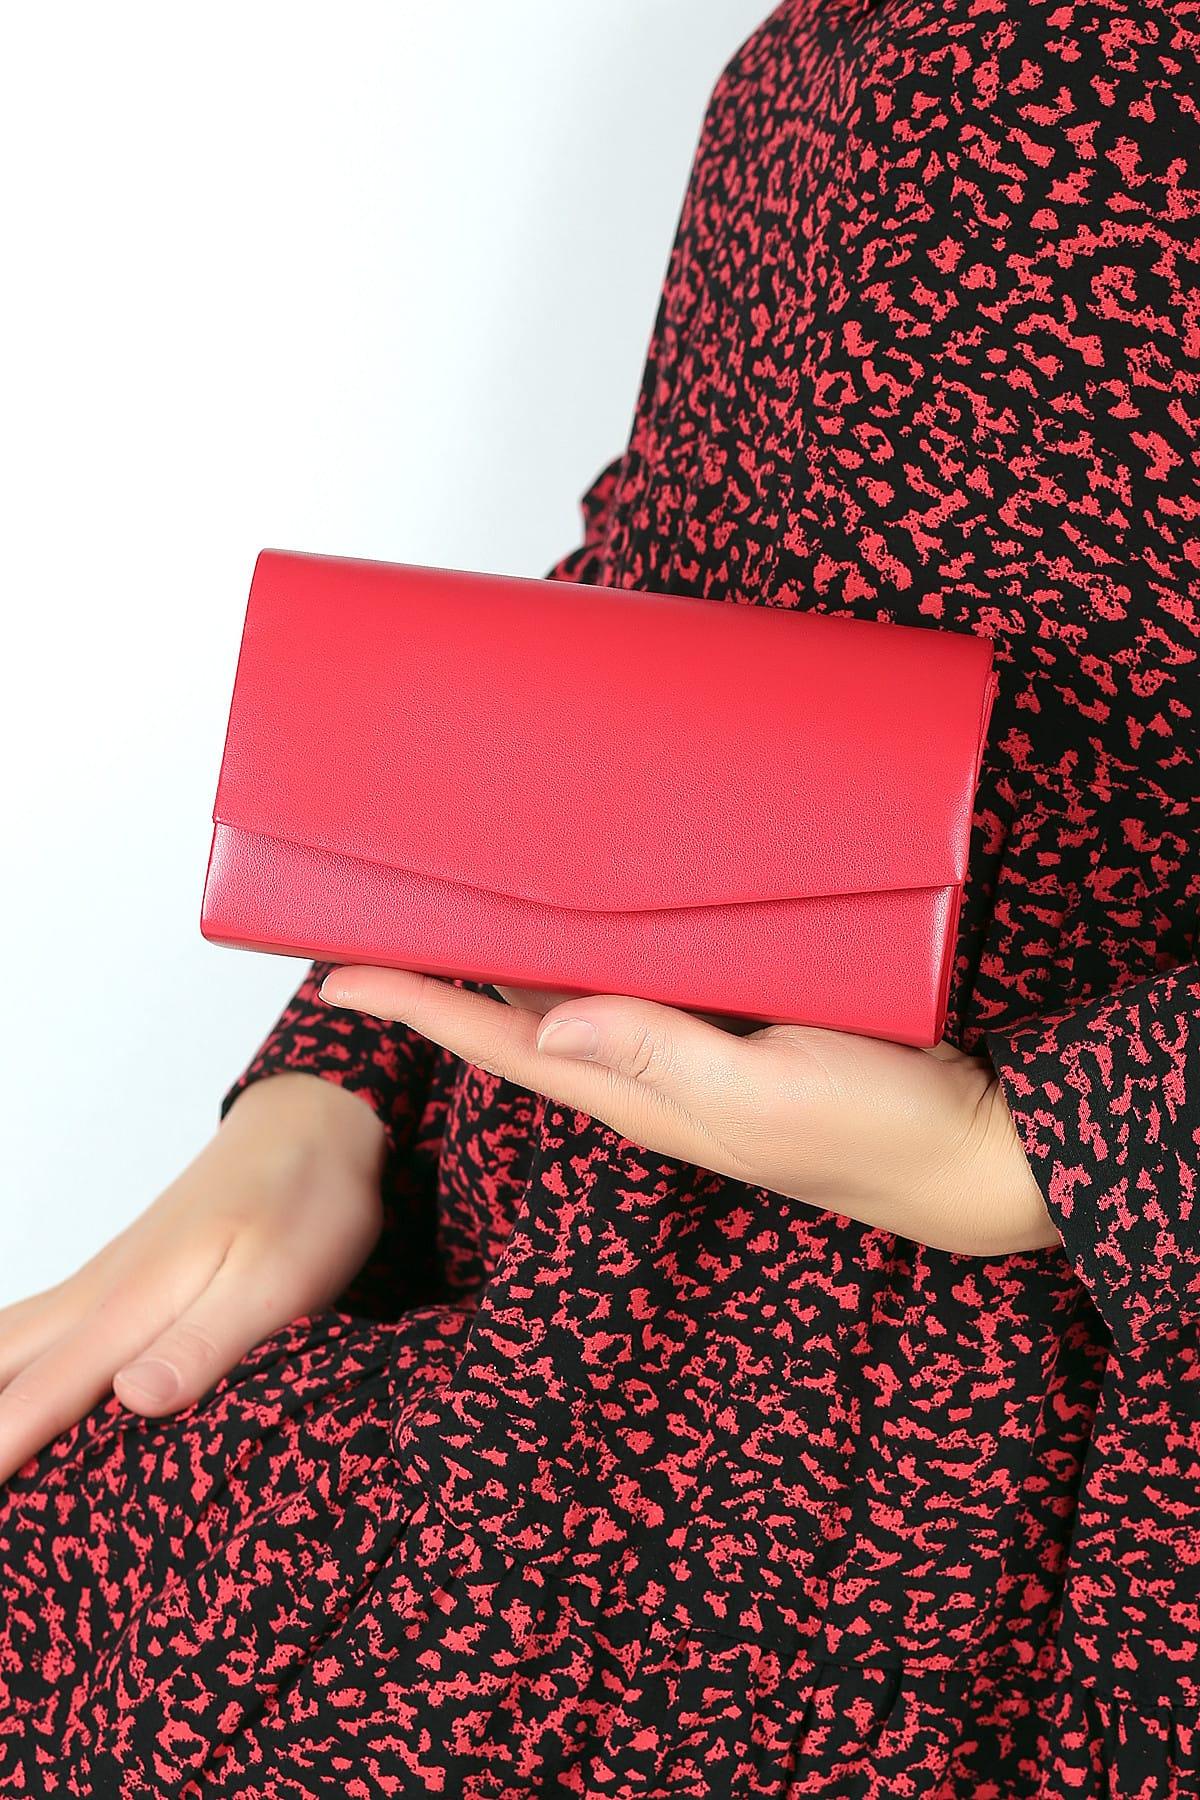 WMİLANO Kırmızı Cilt Kadın El Çantası C0201-18 1